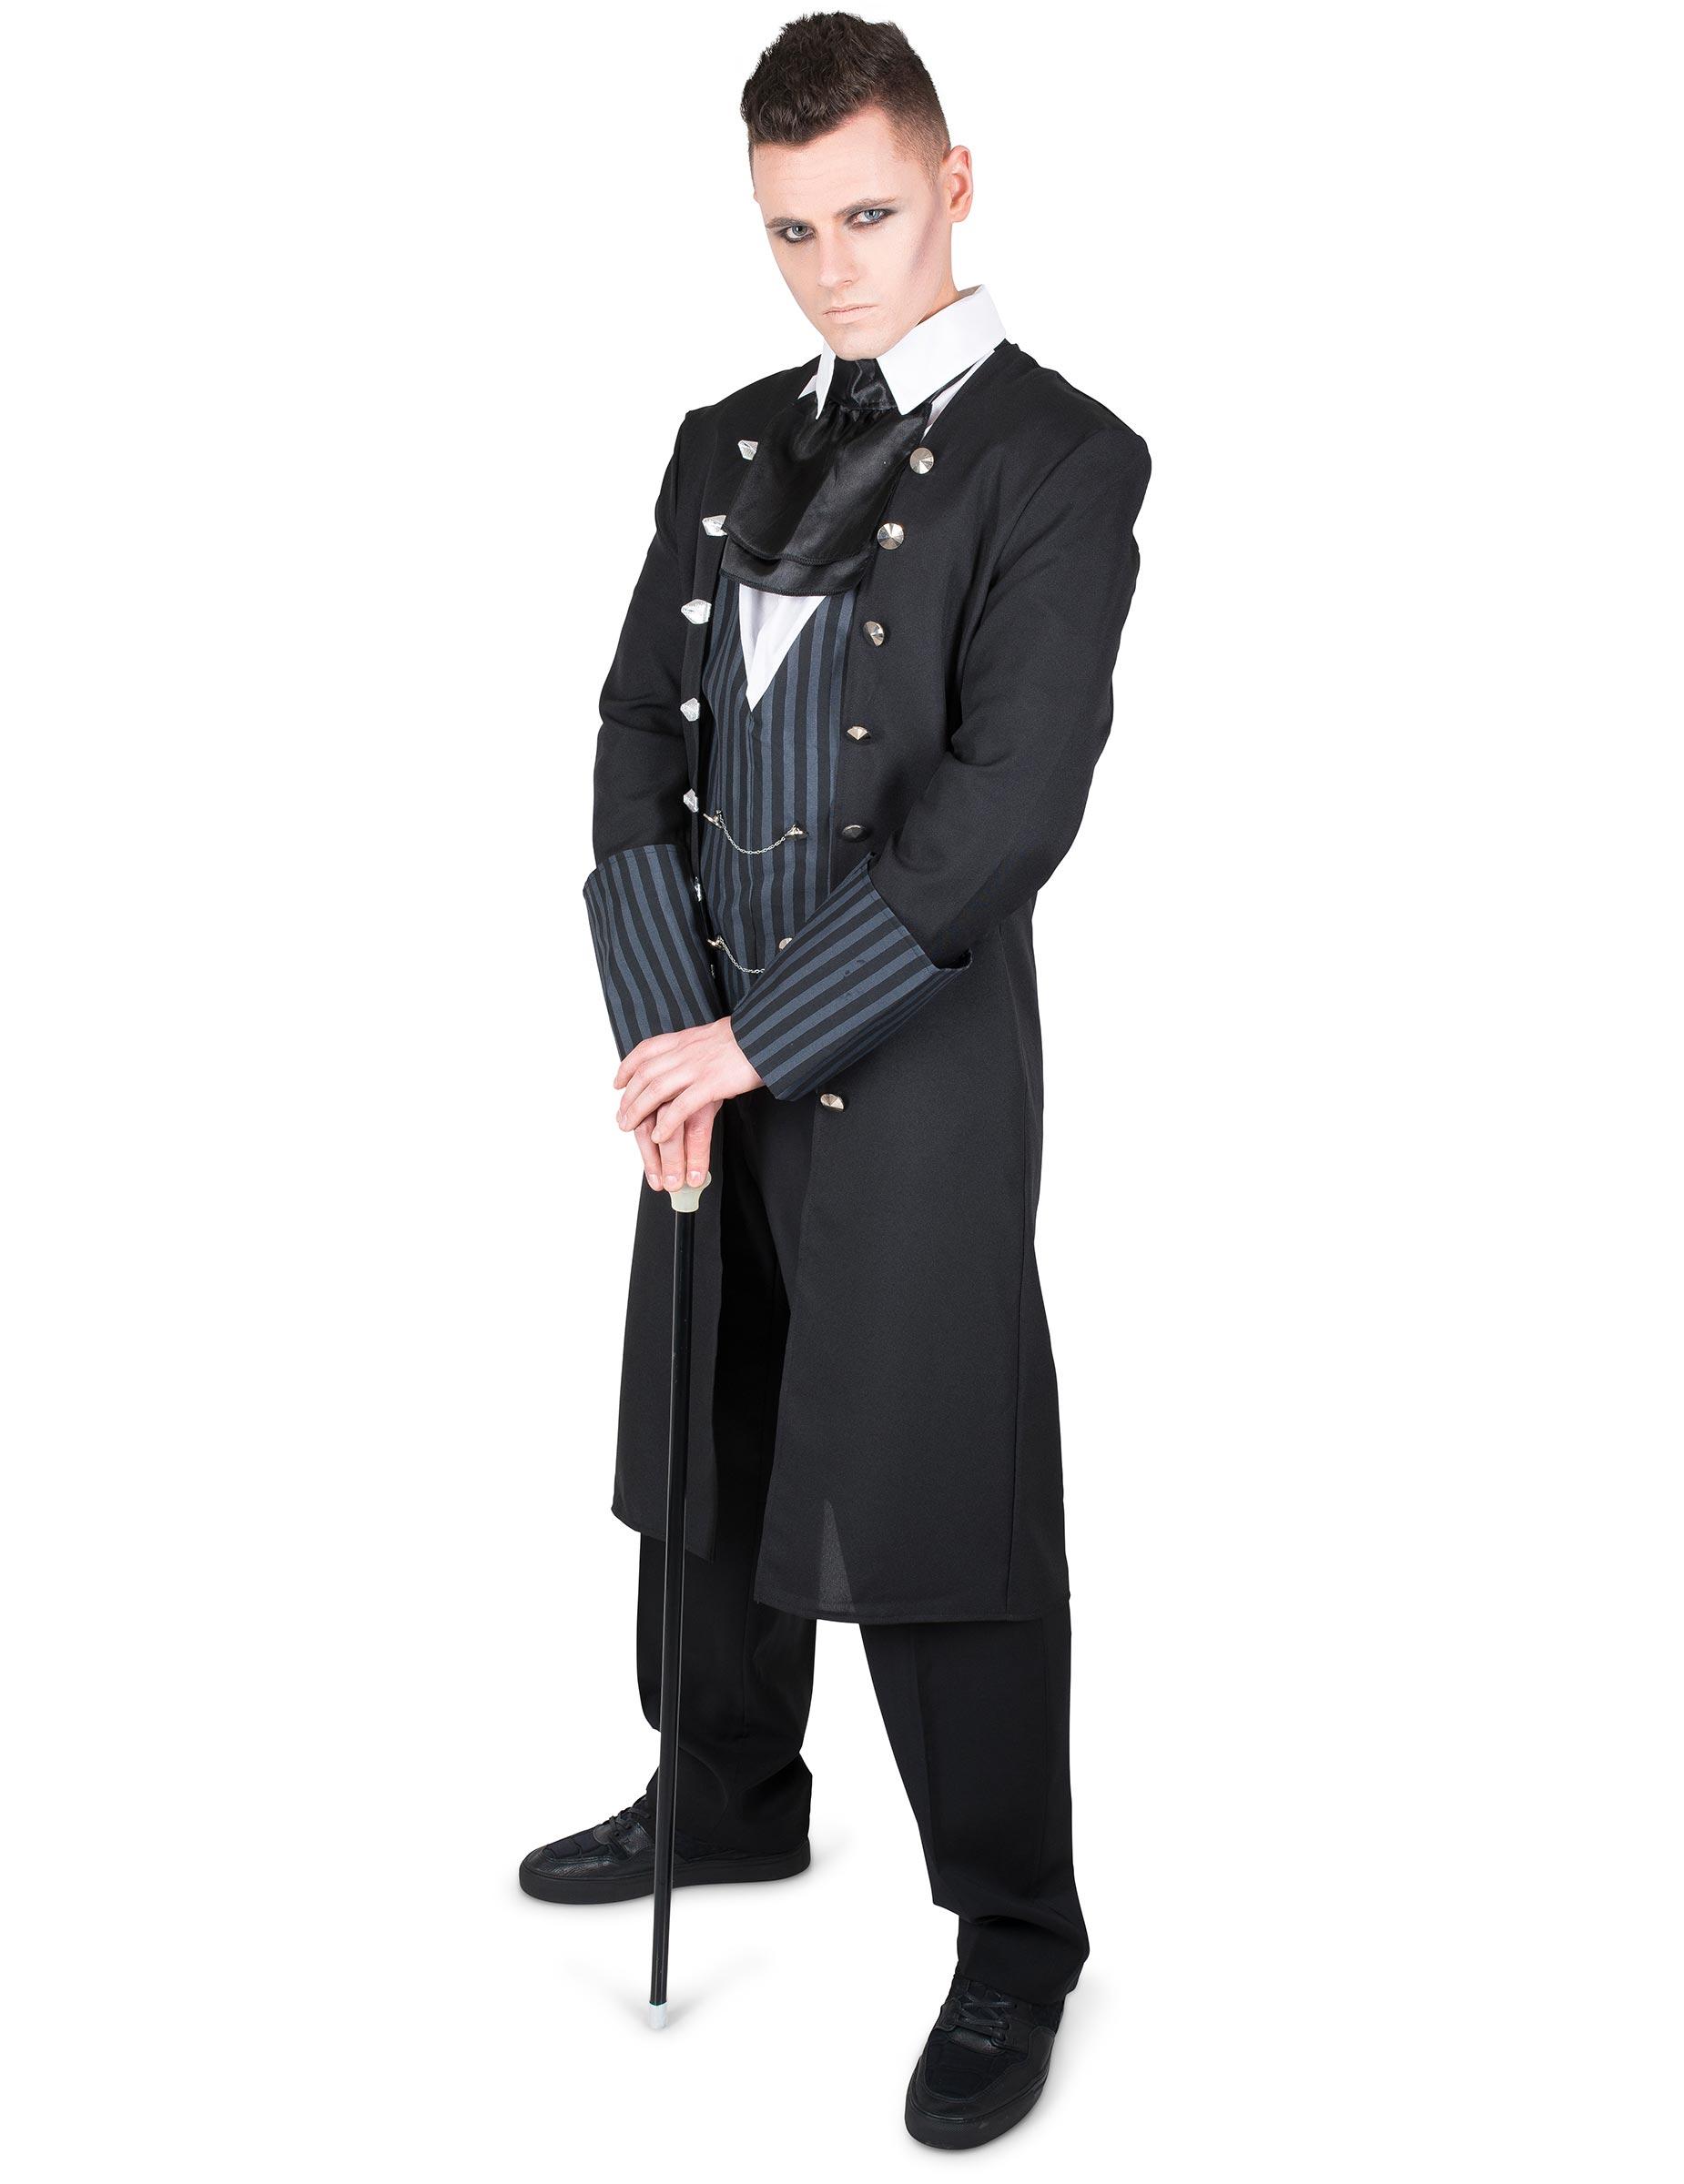 Travestimenti Halloween Uomo.Costume Conte Demoniaco Per Uomo Halloween